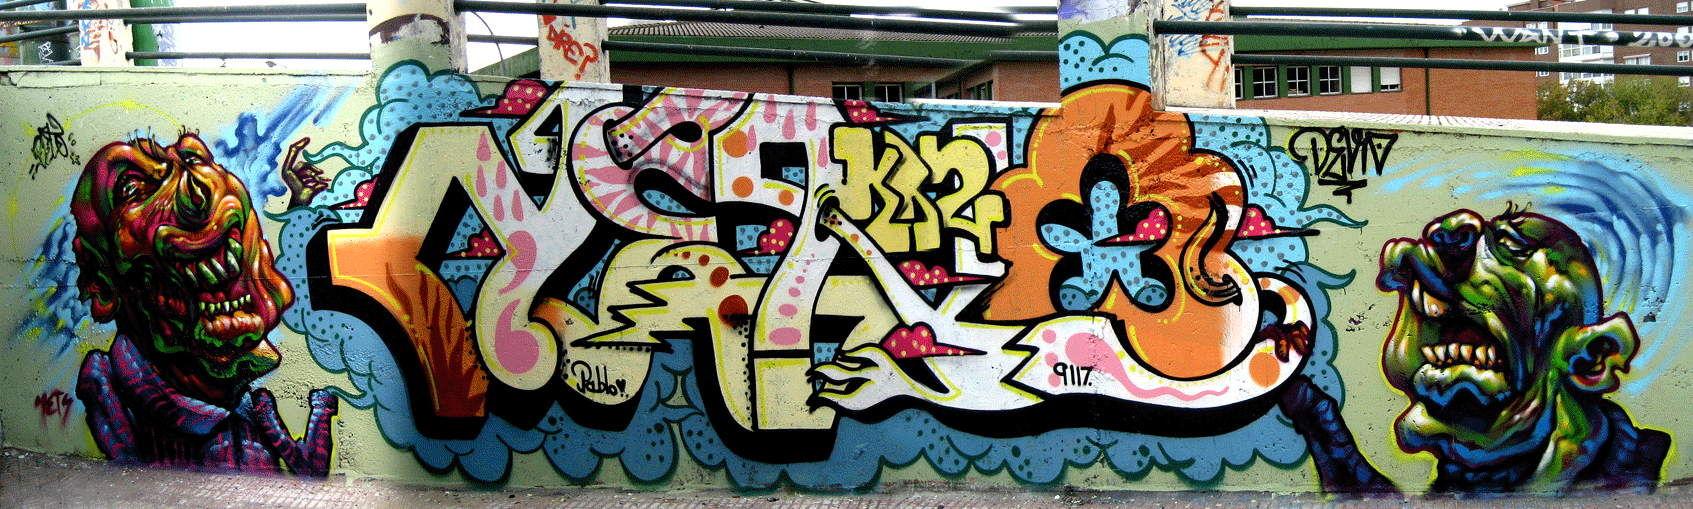 Piece By Beto, Deno - Madrid (Spain) - Street-art and Graffiti ...